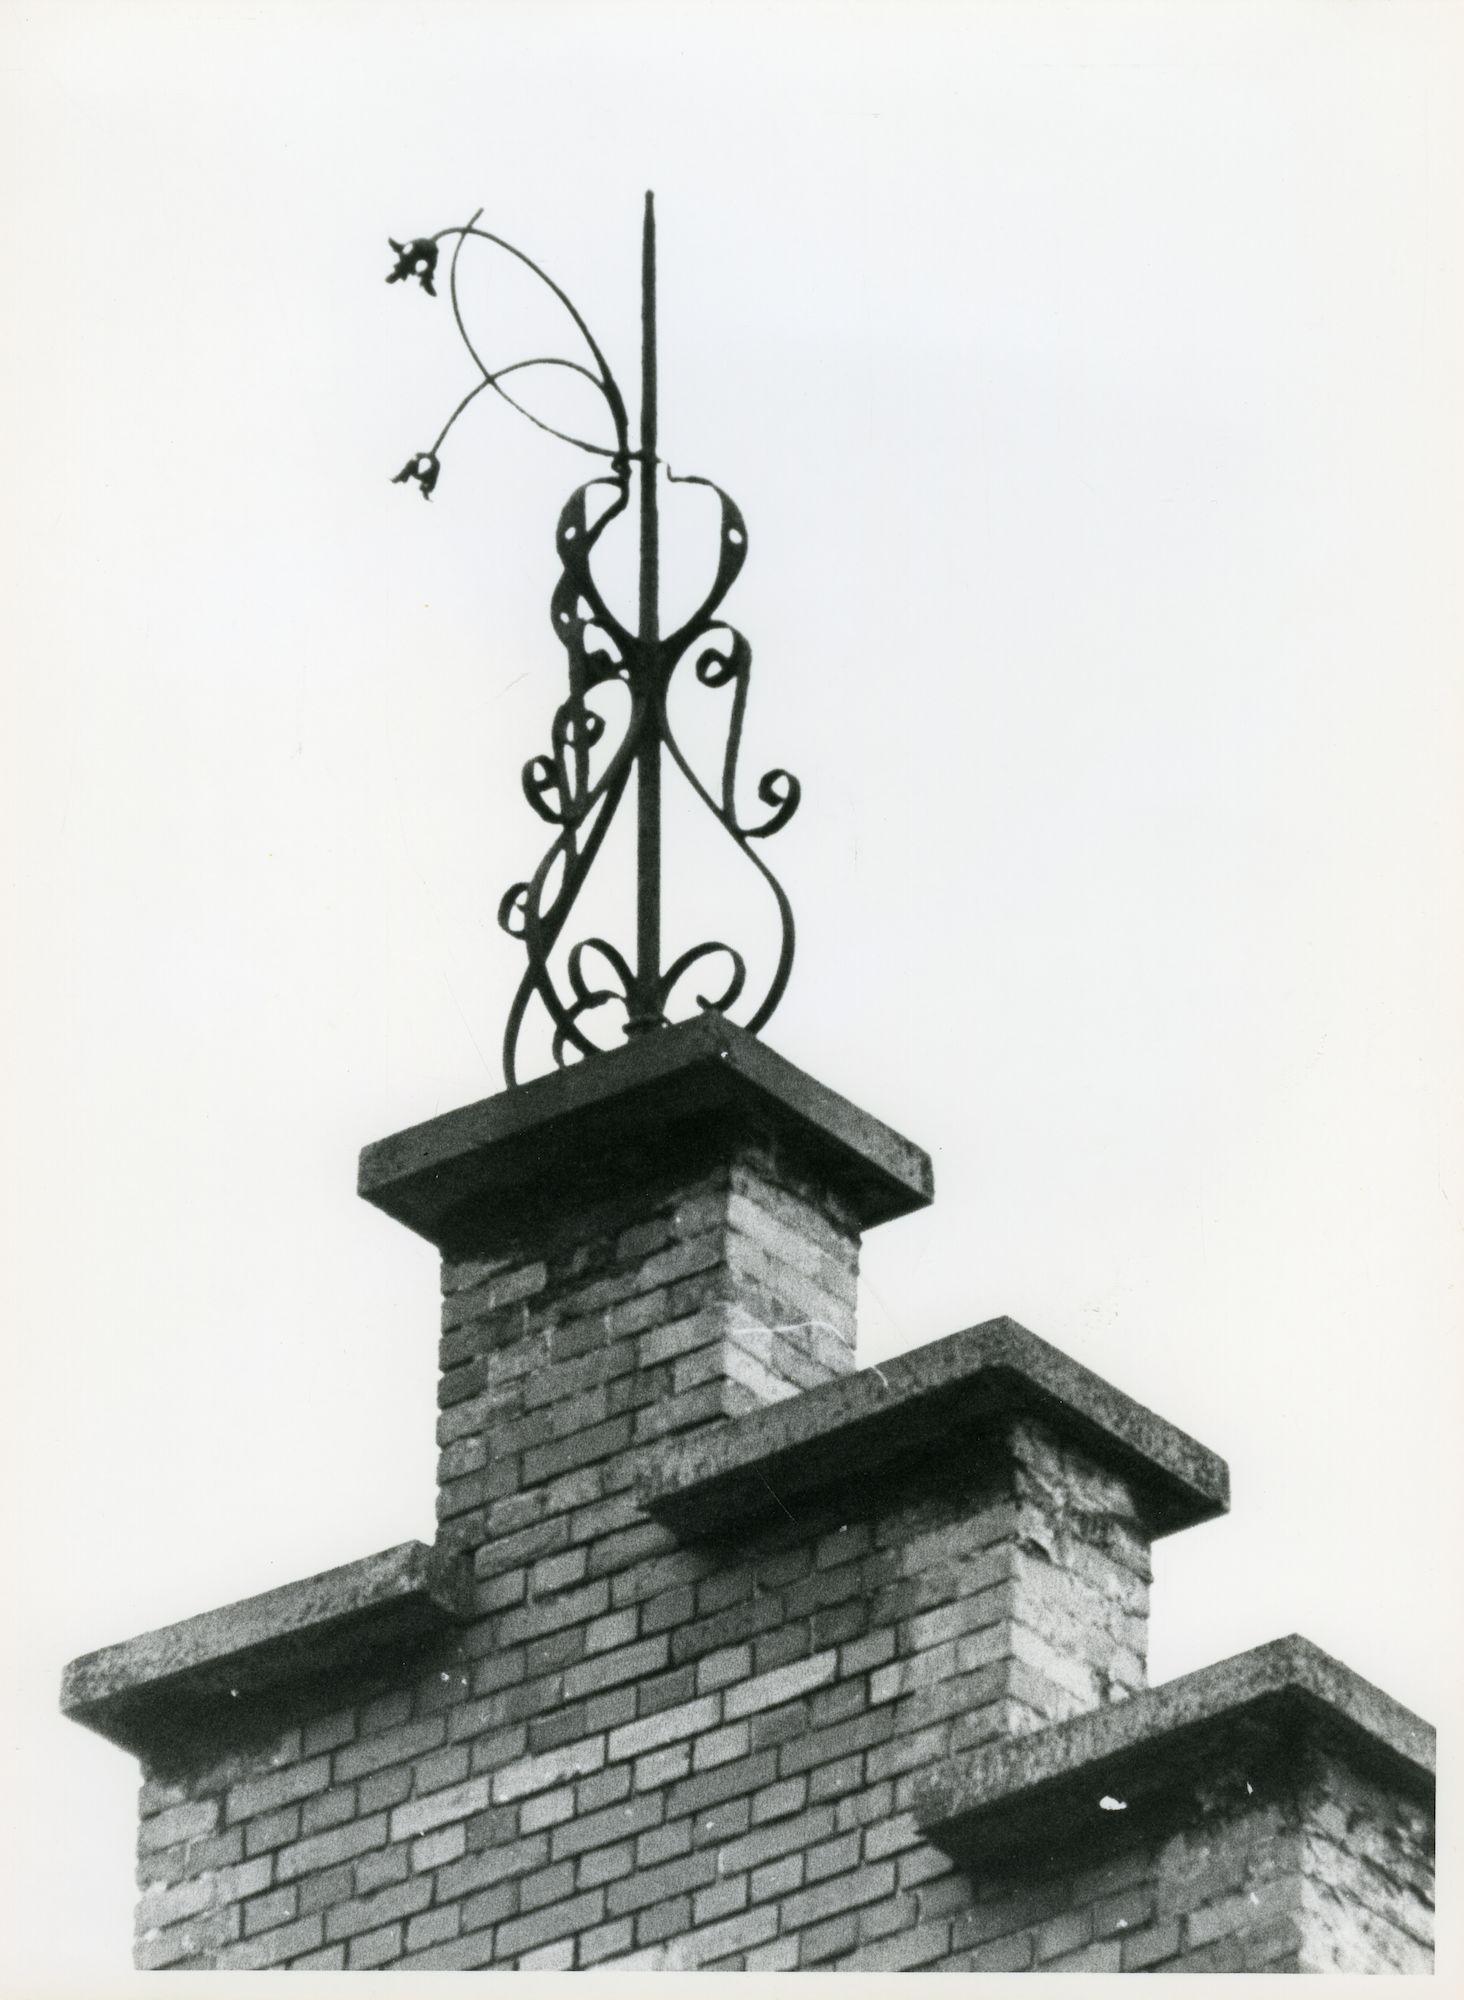 St.-Amandsberg: Bouwmeestersstraat 62: Nokversiering, 1979